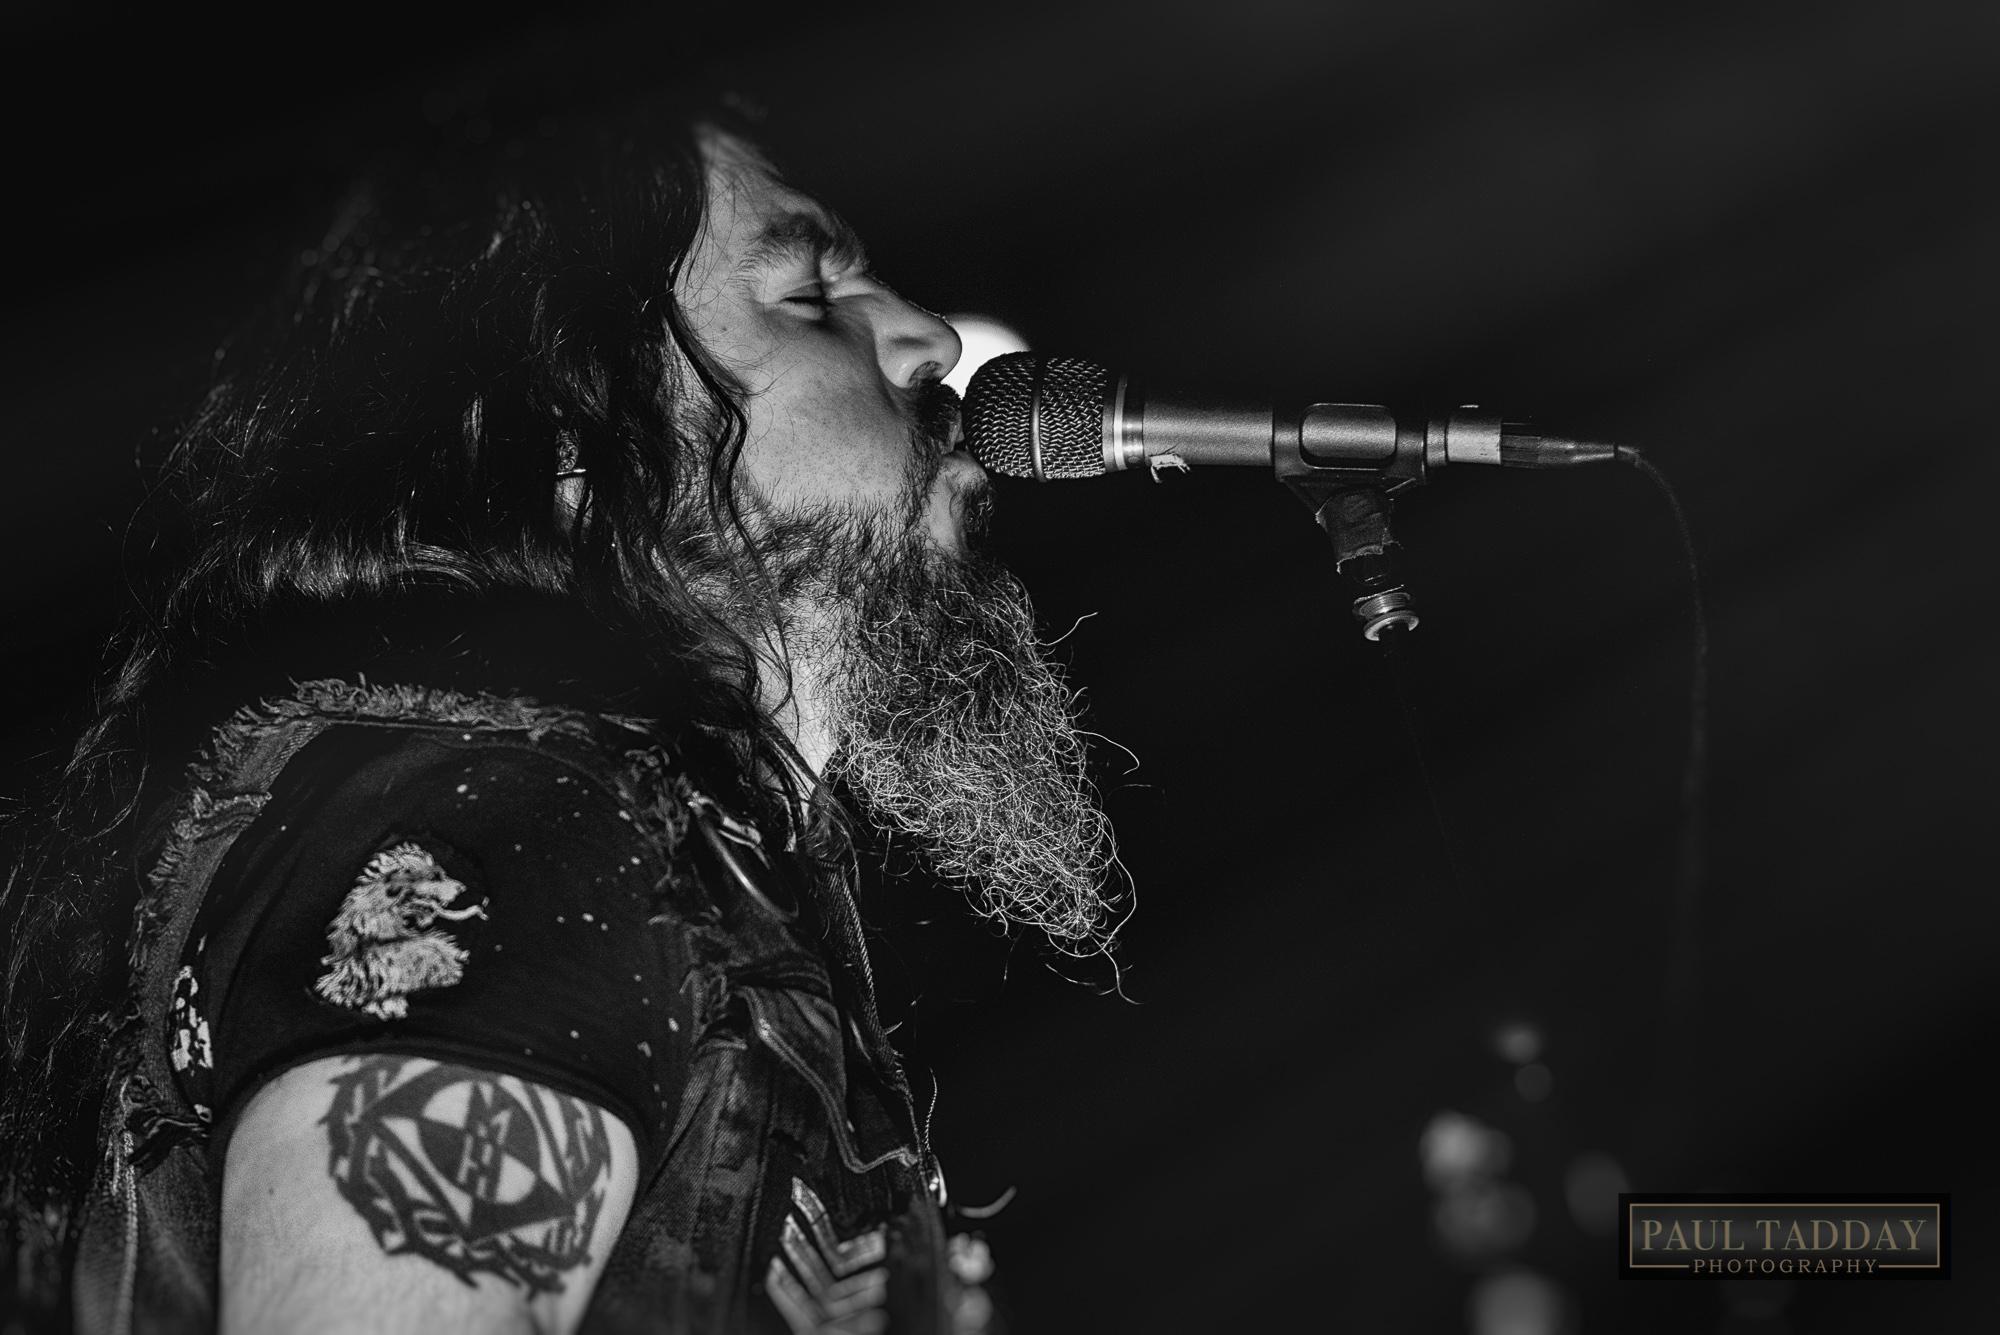 MachineHead-2018-PaulTaddayPhotography-045.jpg